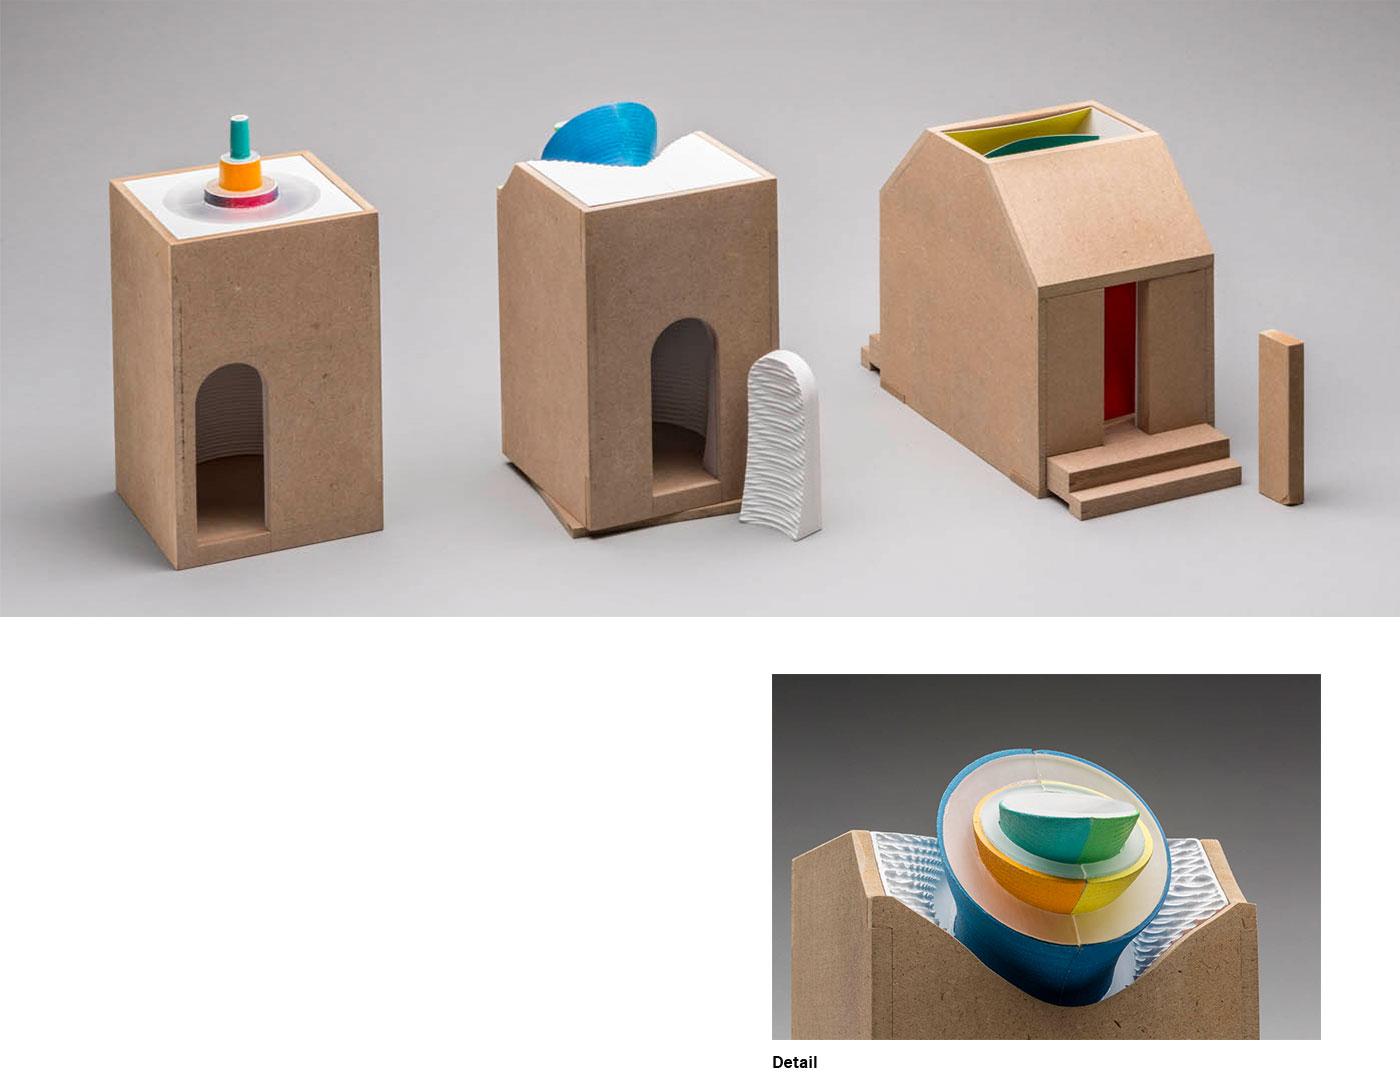 Benas Burdulis - Three Scale Models for Daylight Study